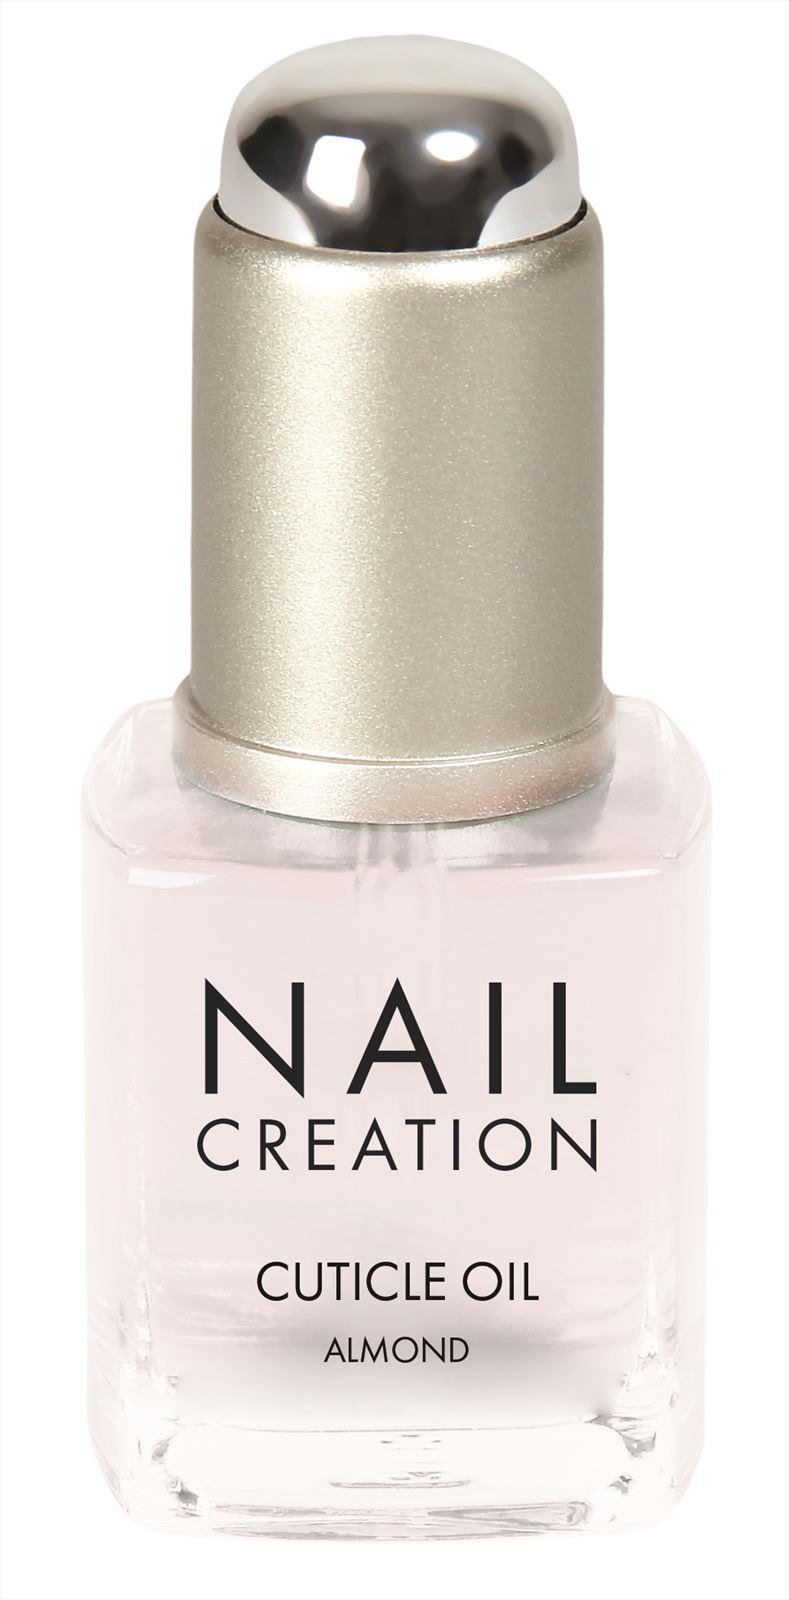 Afbeelding van Nail Creation Cuticle Oil - Almond